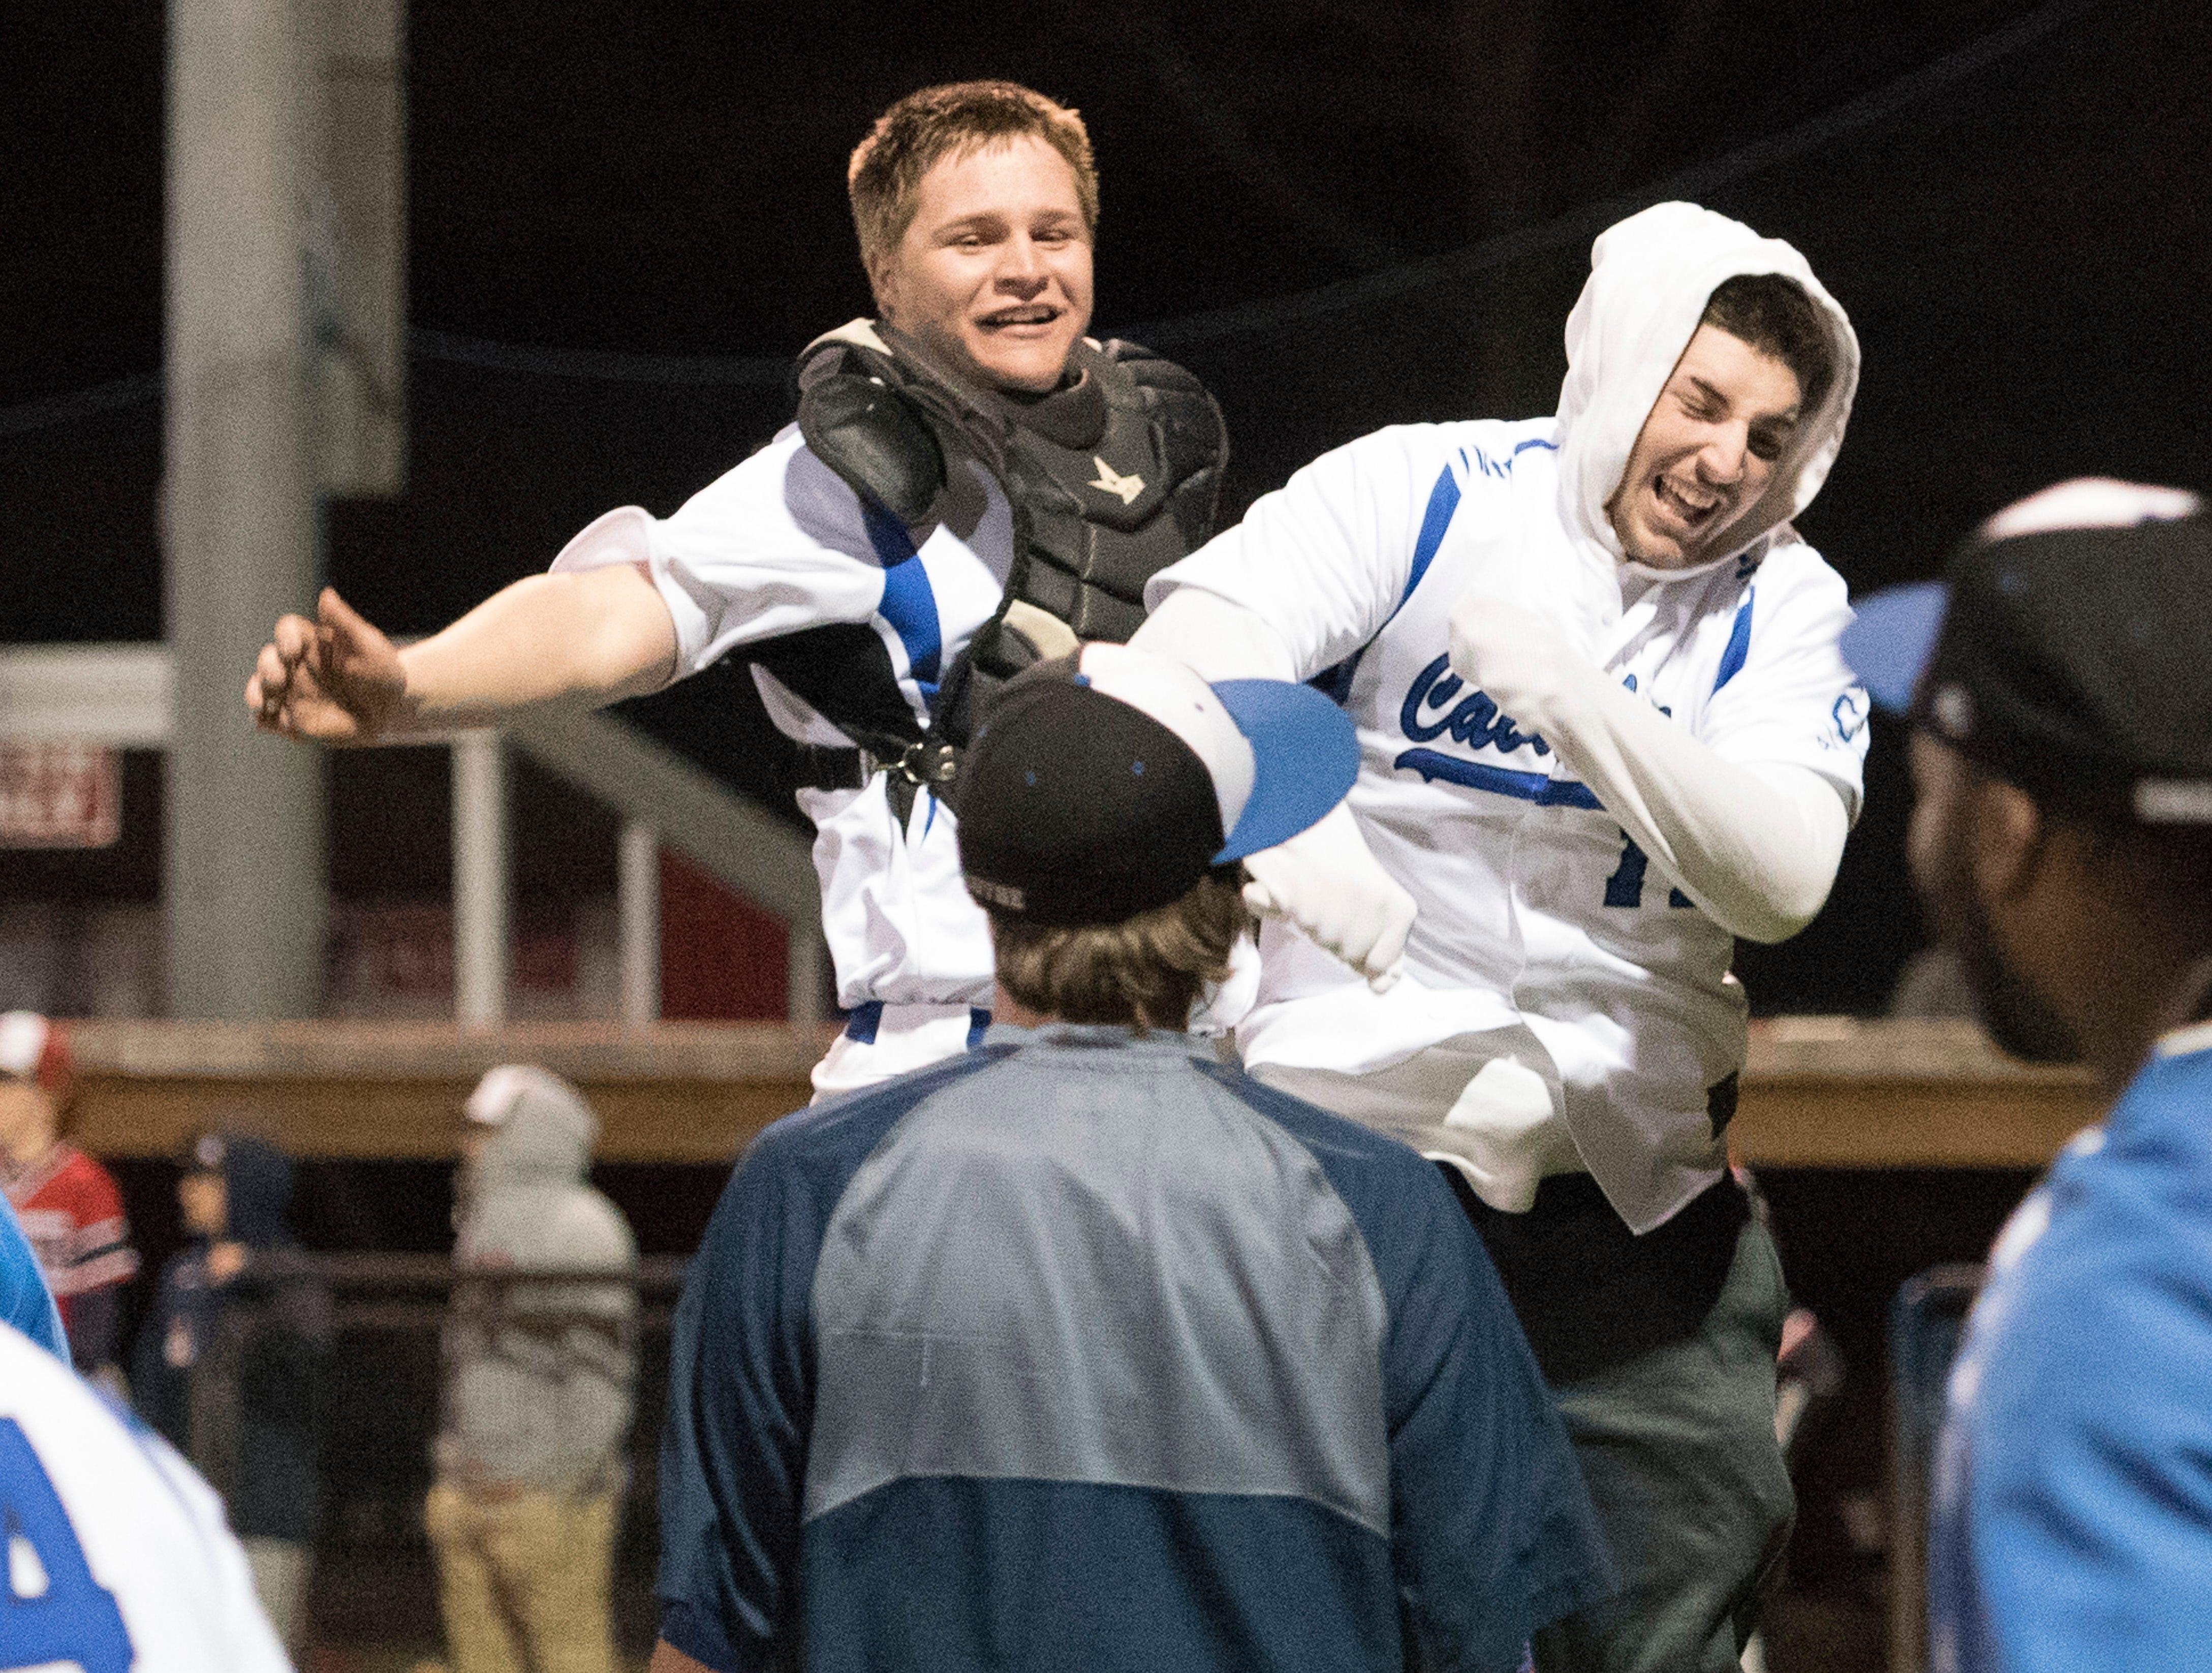 Chillicothe defeated Thomas Worthington 13-12 Tuesday night at the VA Memorial Stadium in Chillicothe, Ohio.